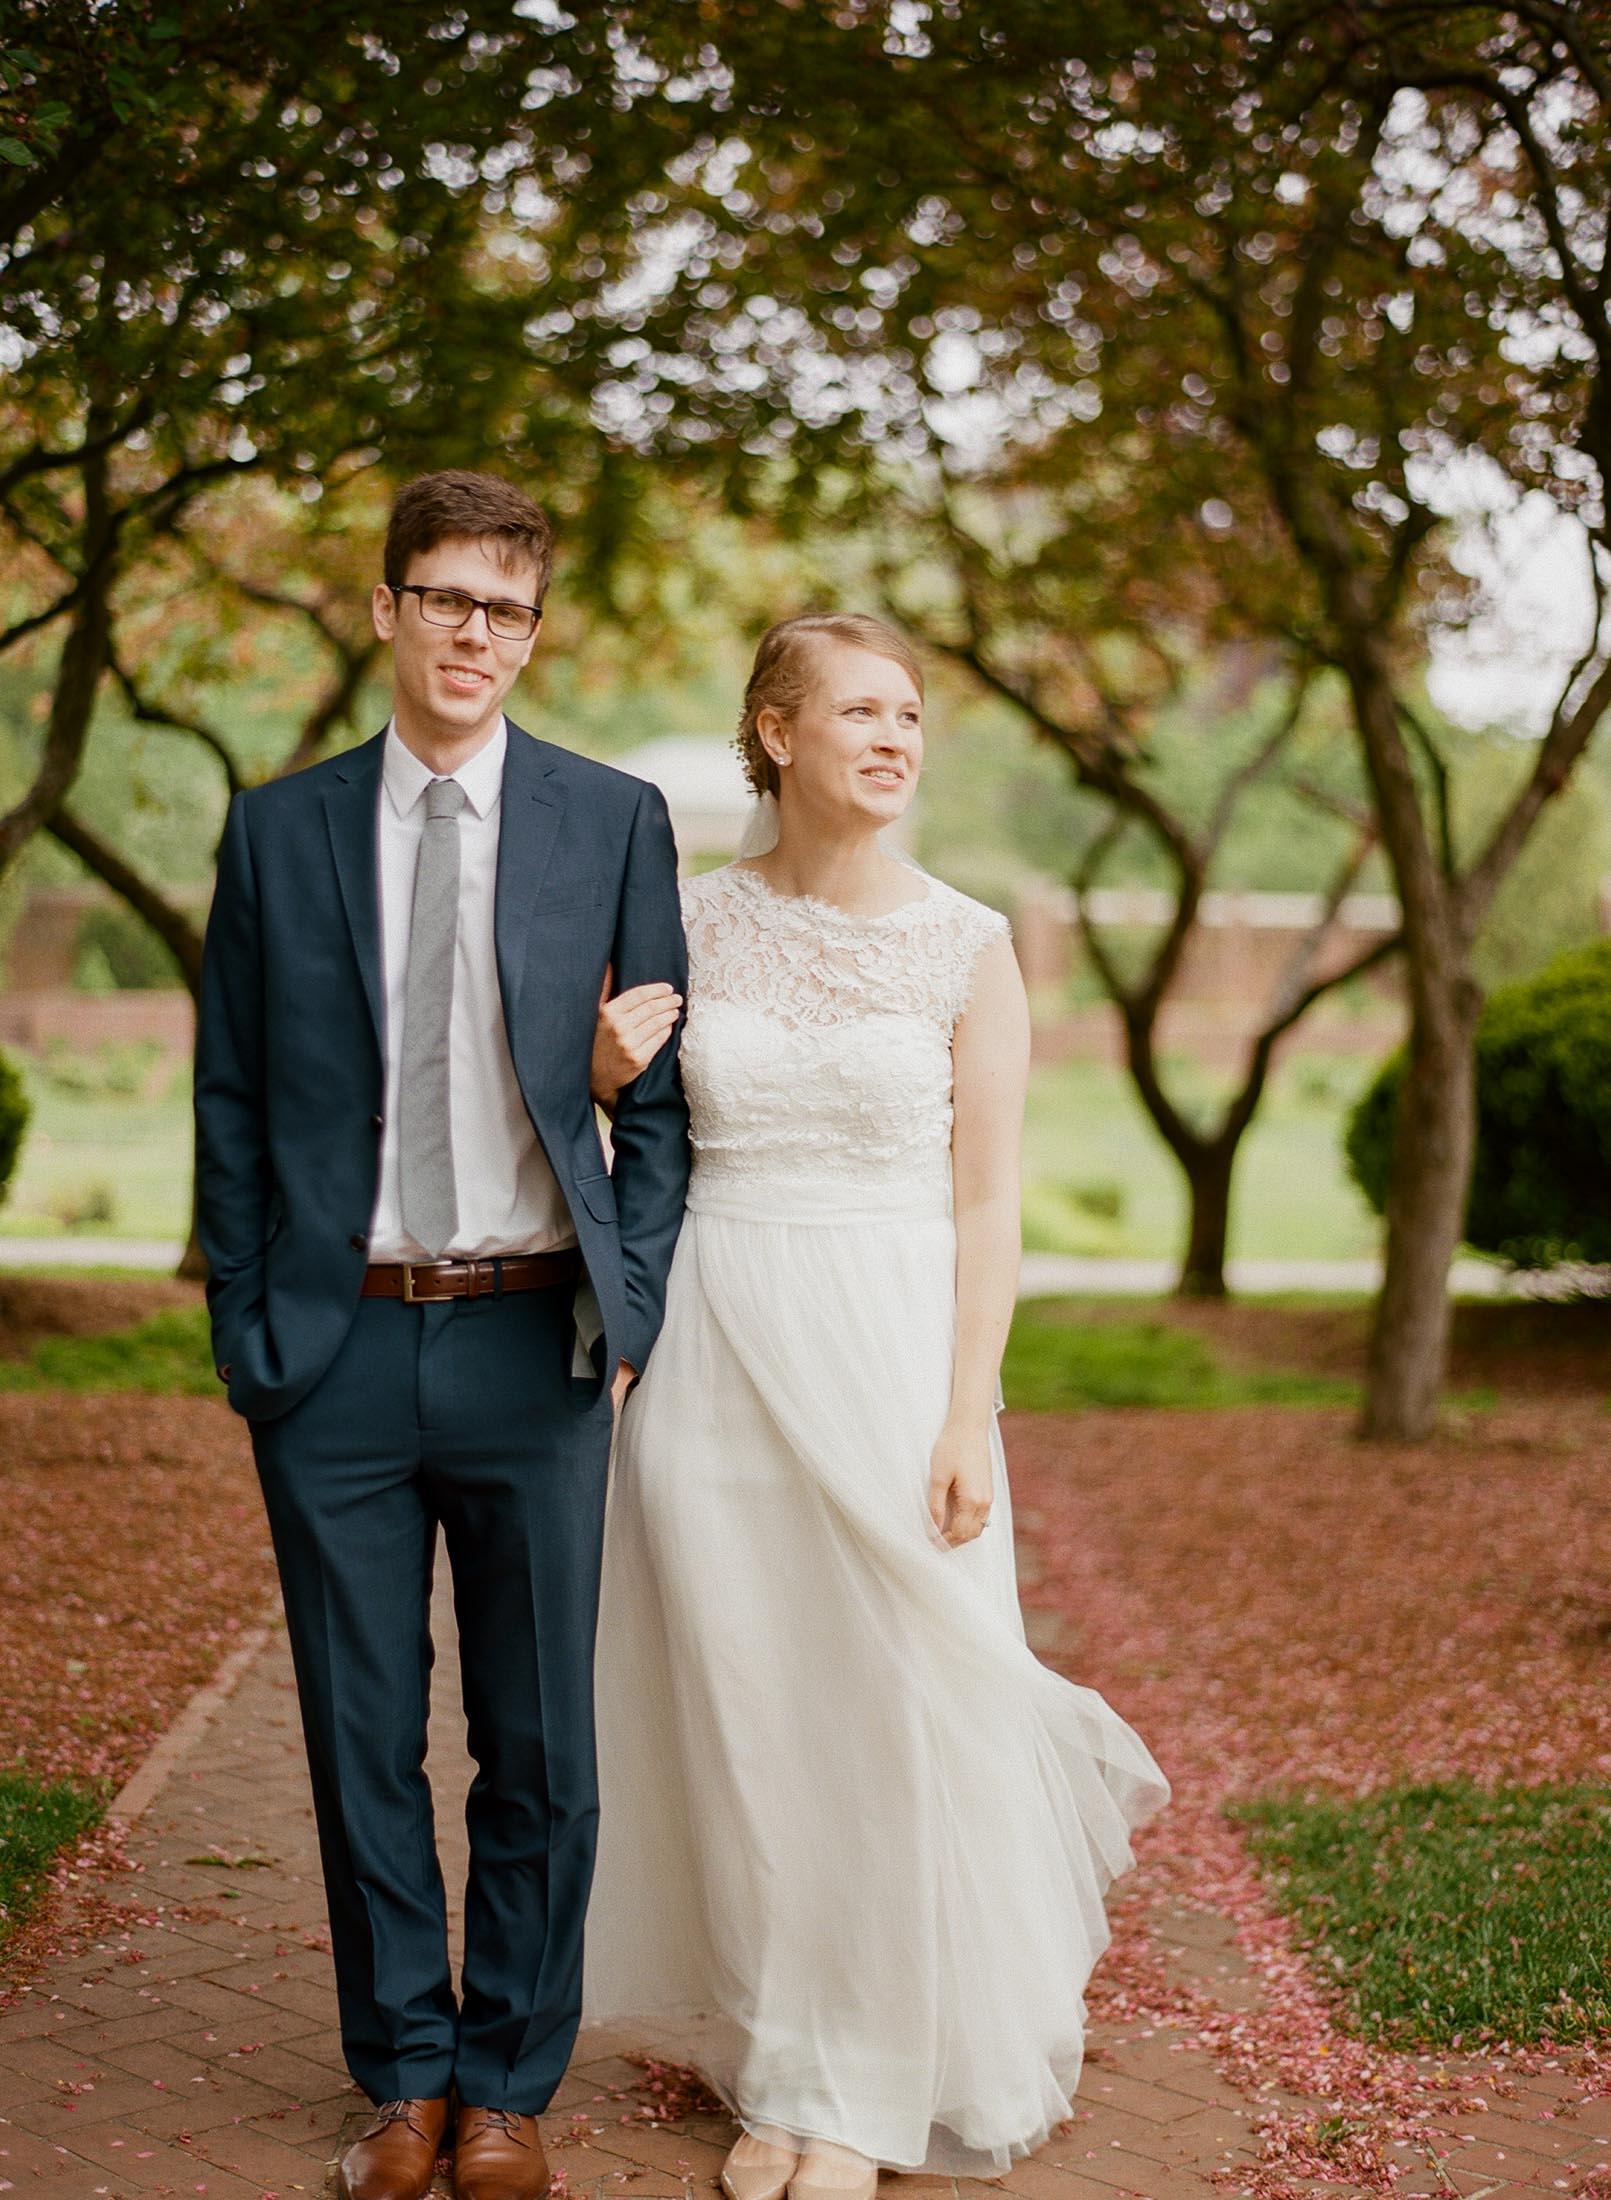 Elks-Wedding-Gloucester-47.jpg